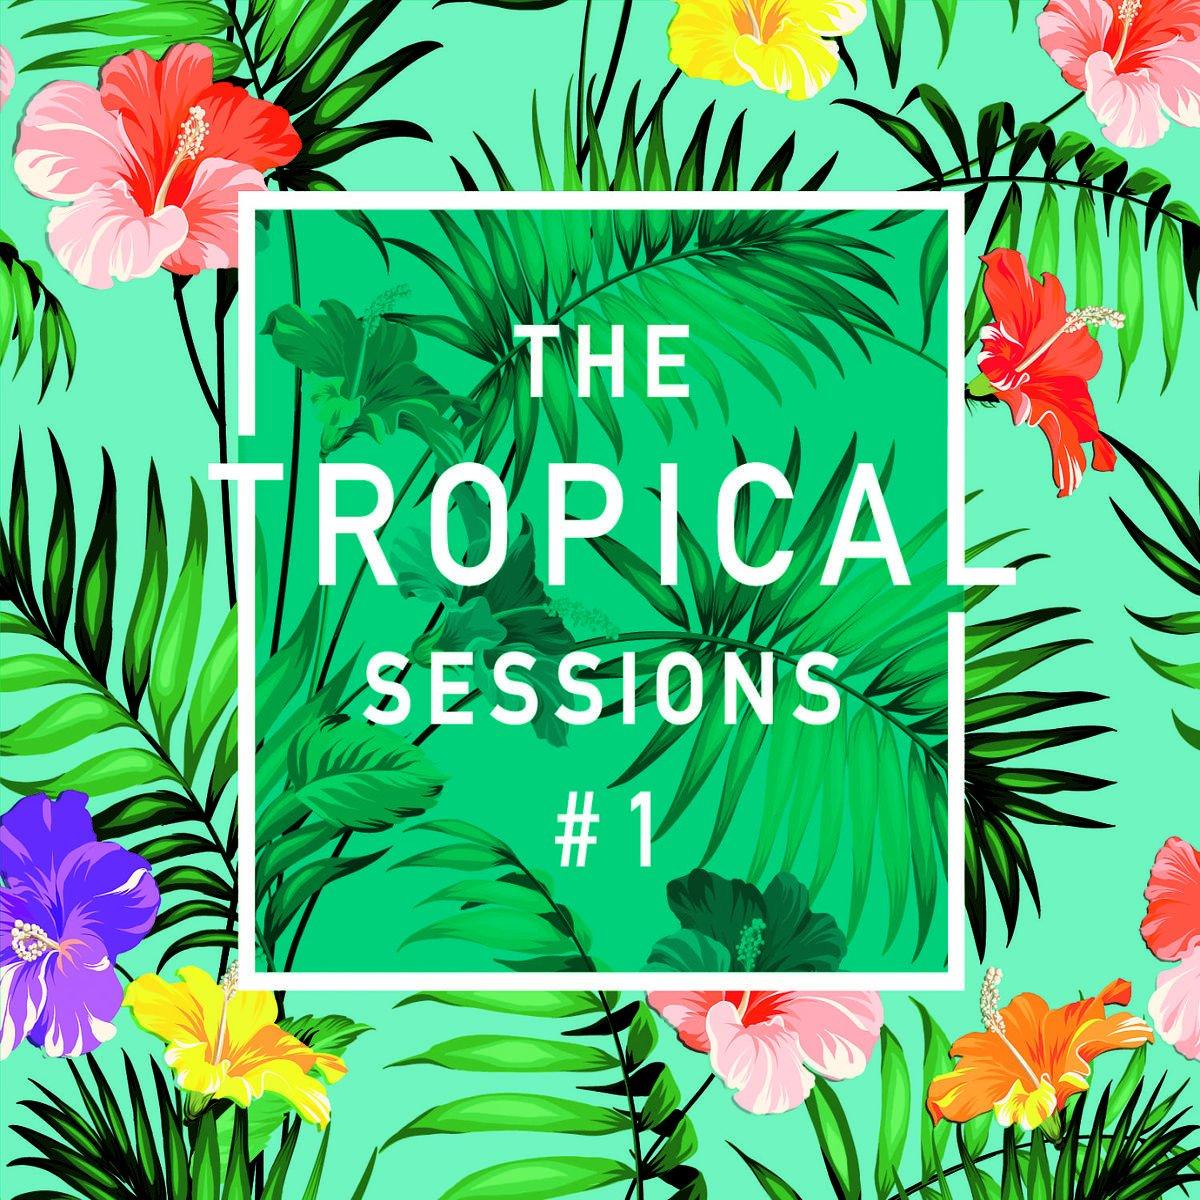 VA-The Tropical Sessions 1-DIGIPAK-2CD-FLAC-2015-VOLDiES